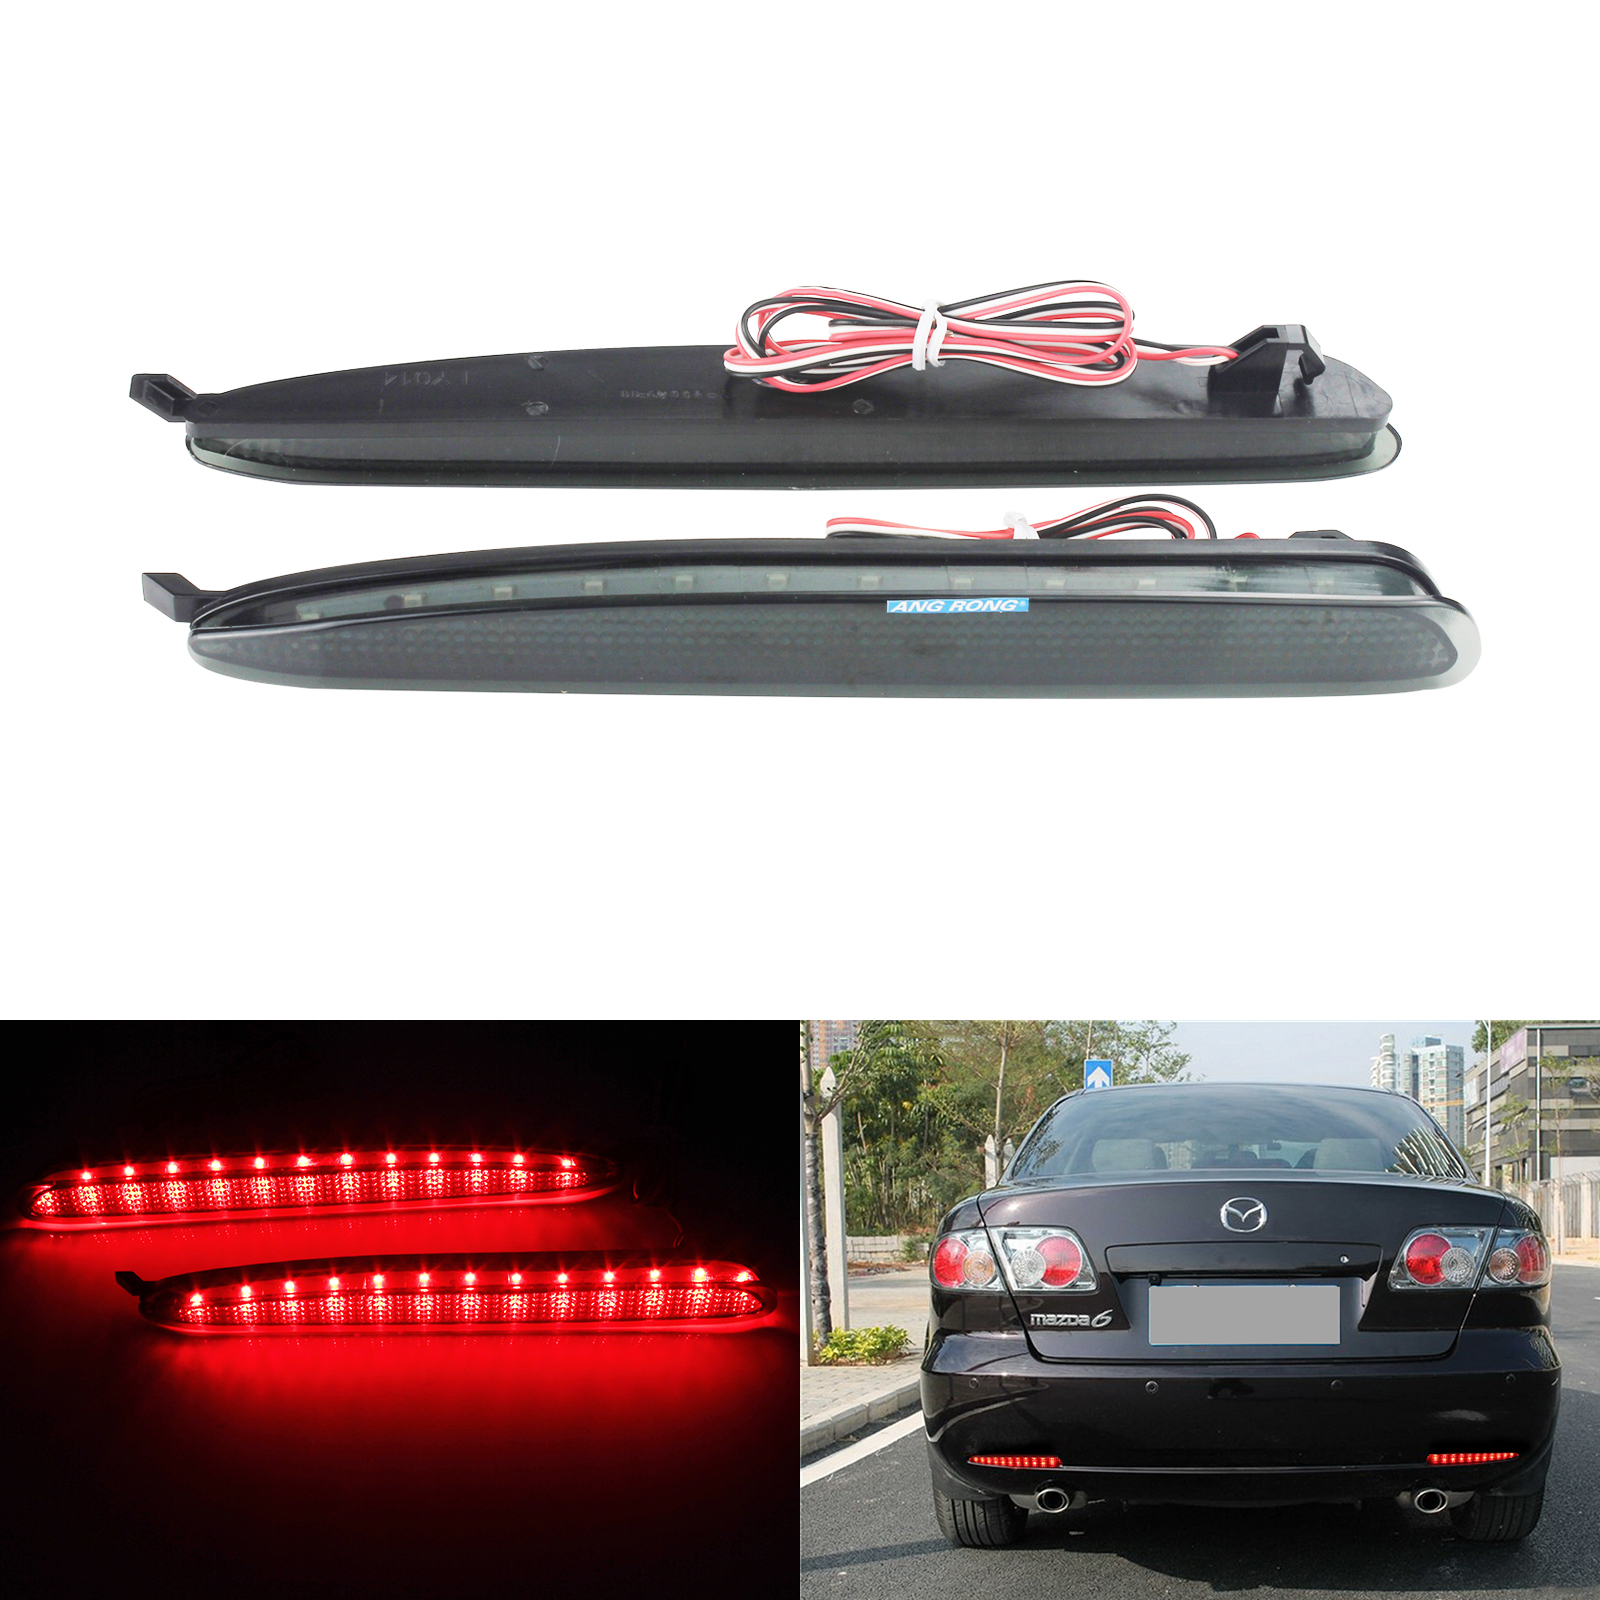 Mazda 6 Atenza 2013 Mazda3 4D Red Rear Bumper Reflector LED Tail Stop Light DRL